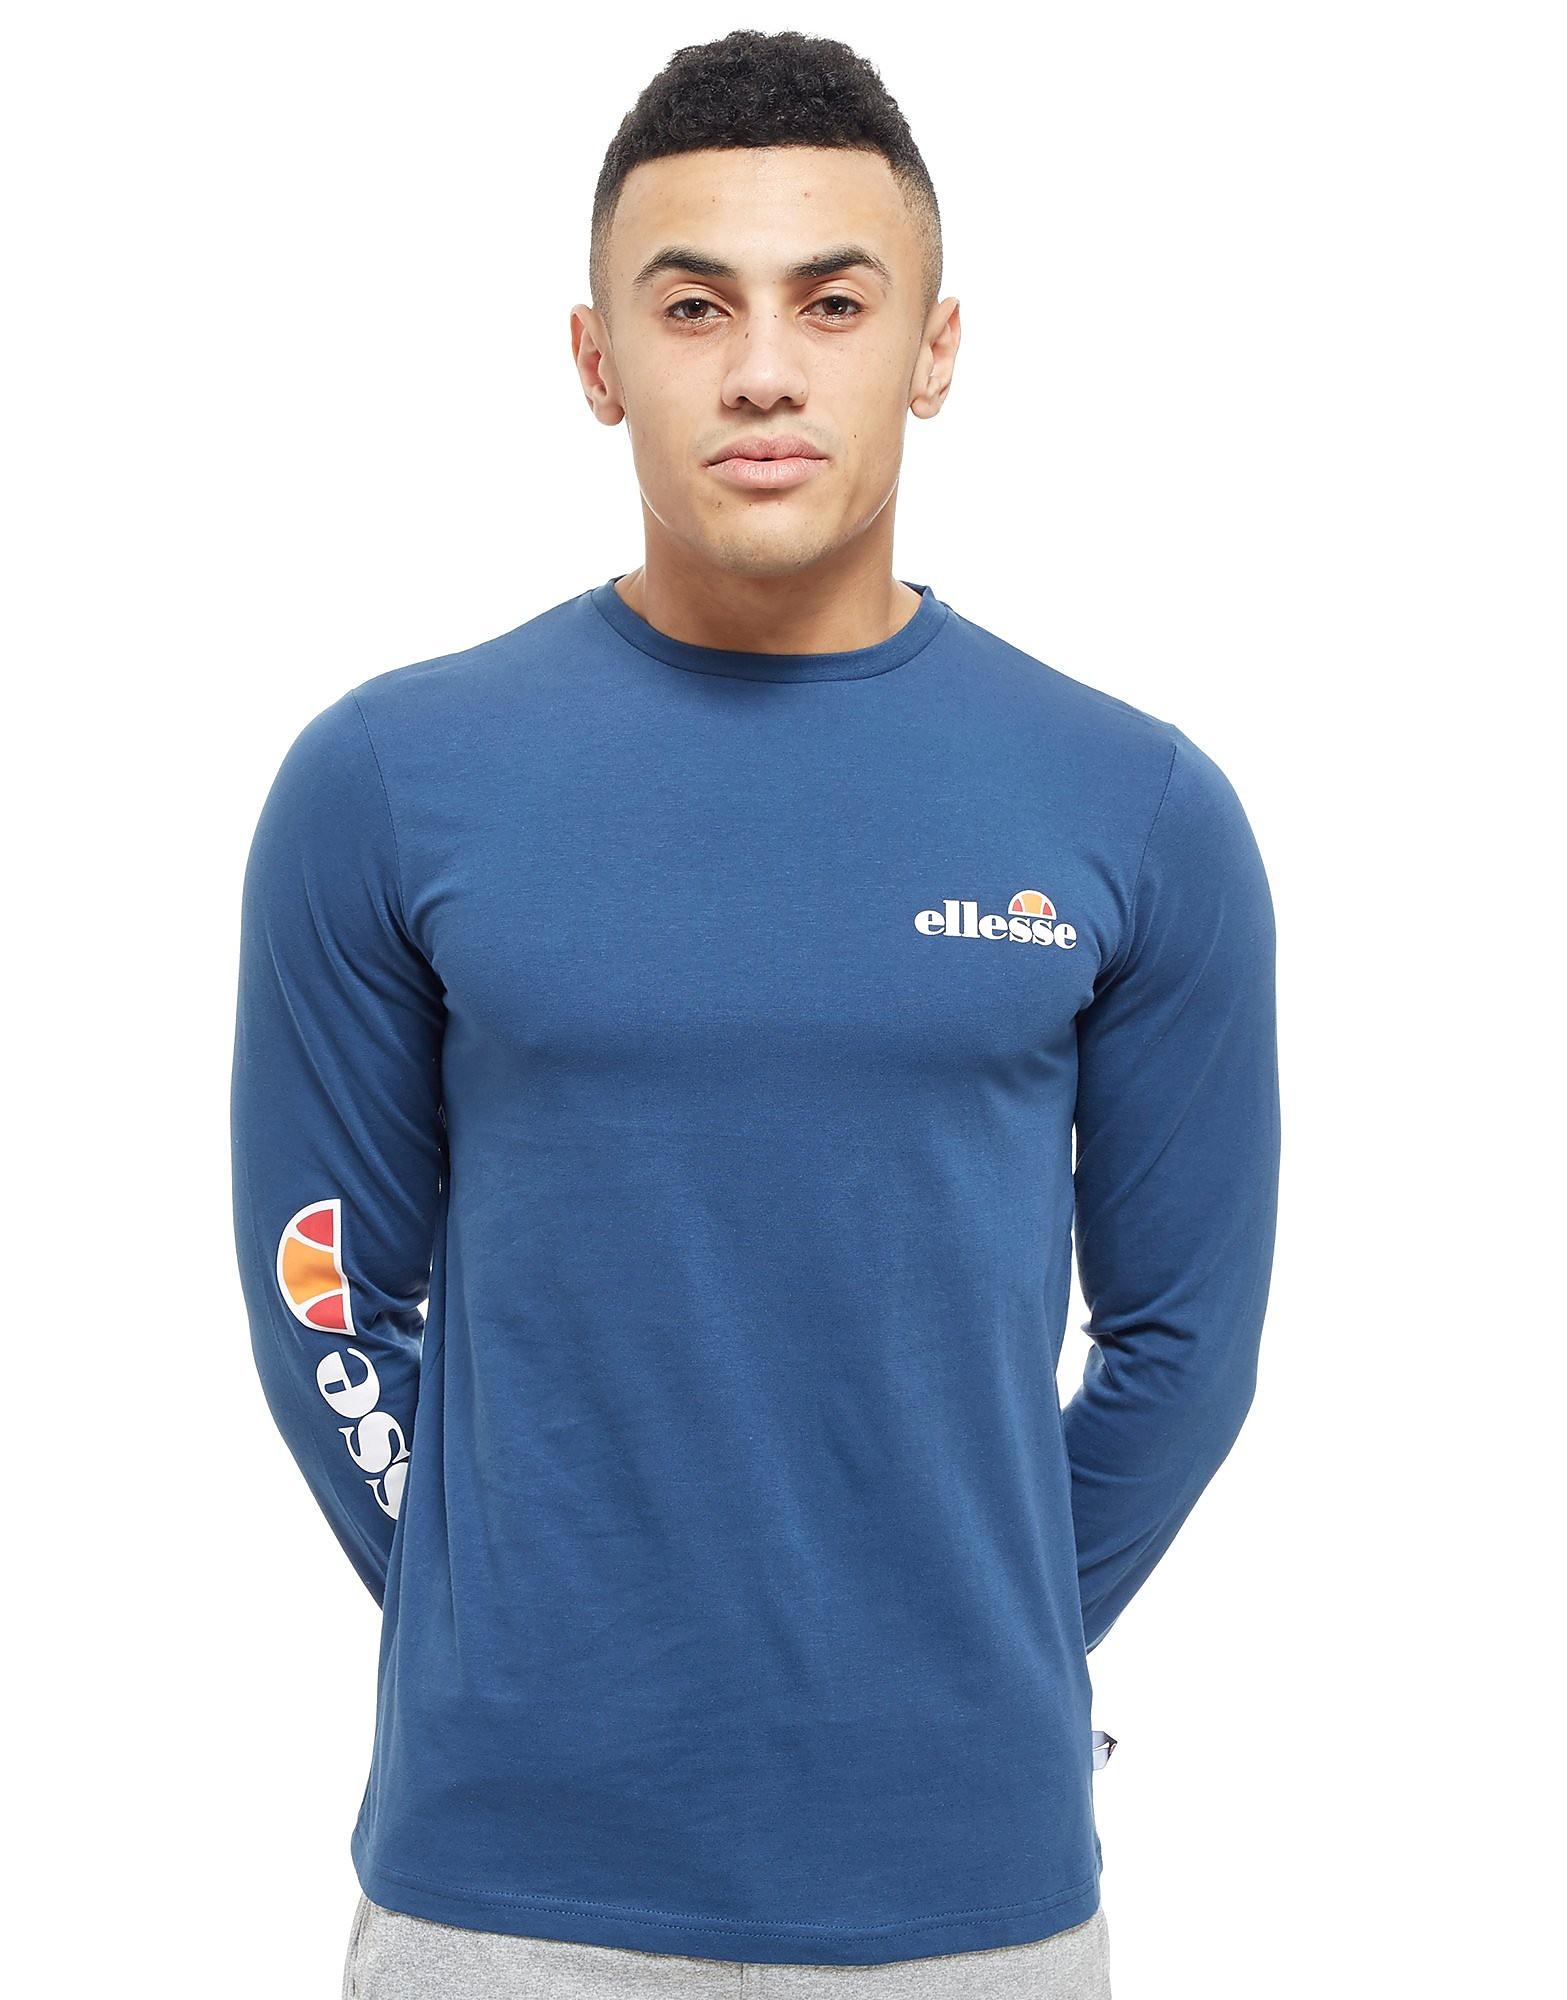 Ellesse Thiero Long Sleeve T-Shirt